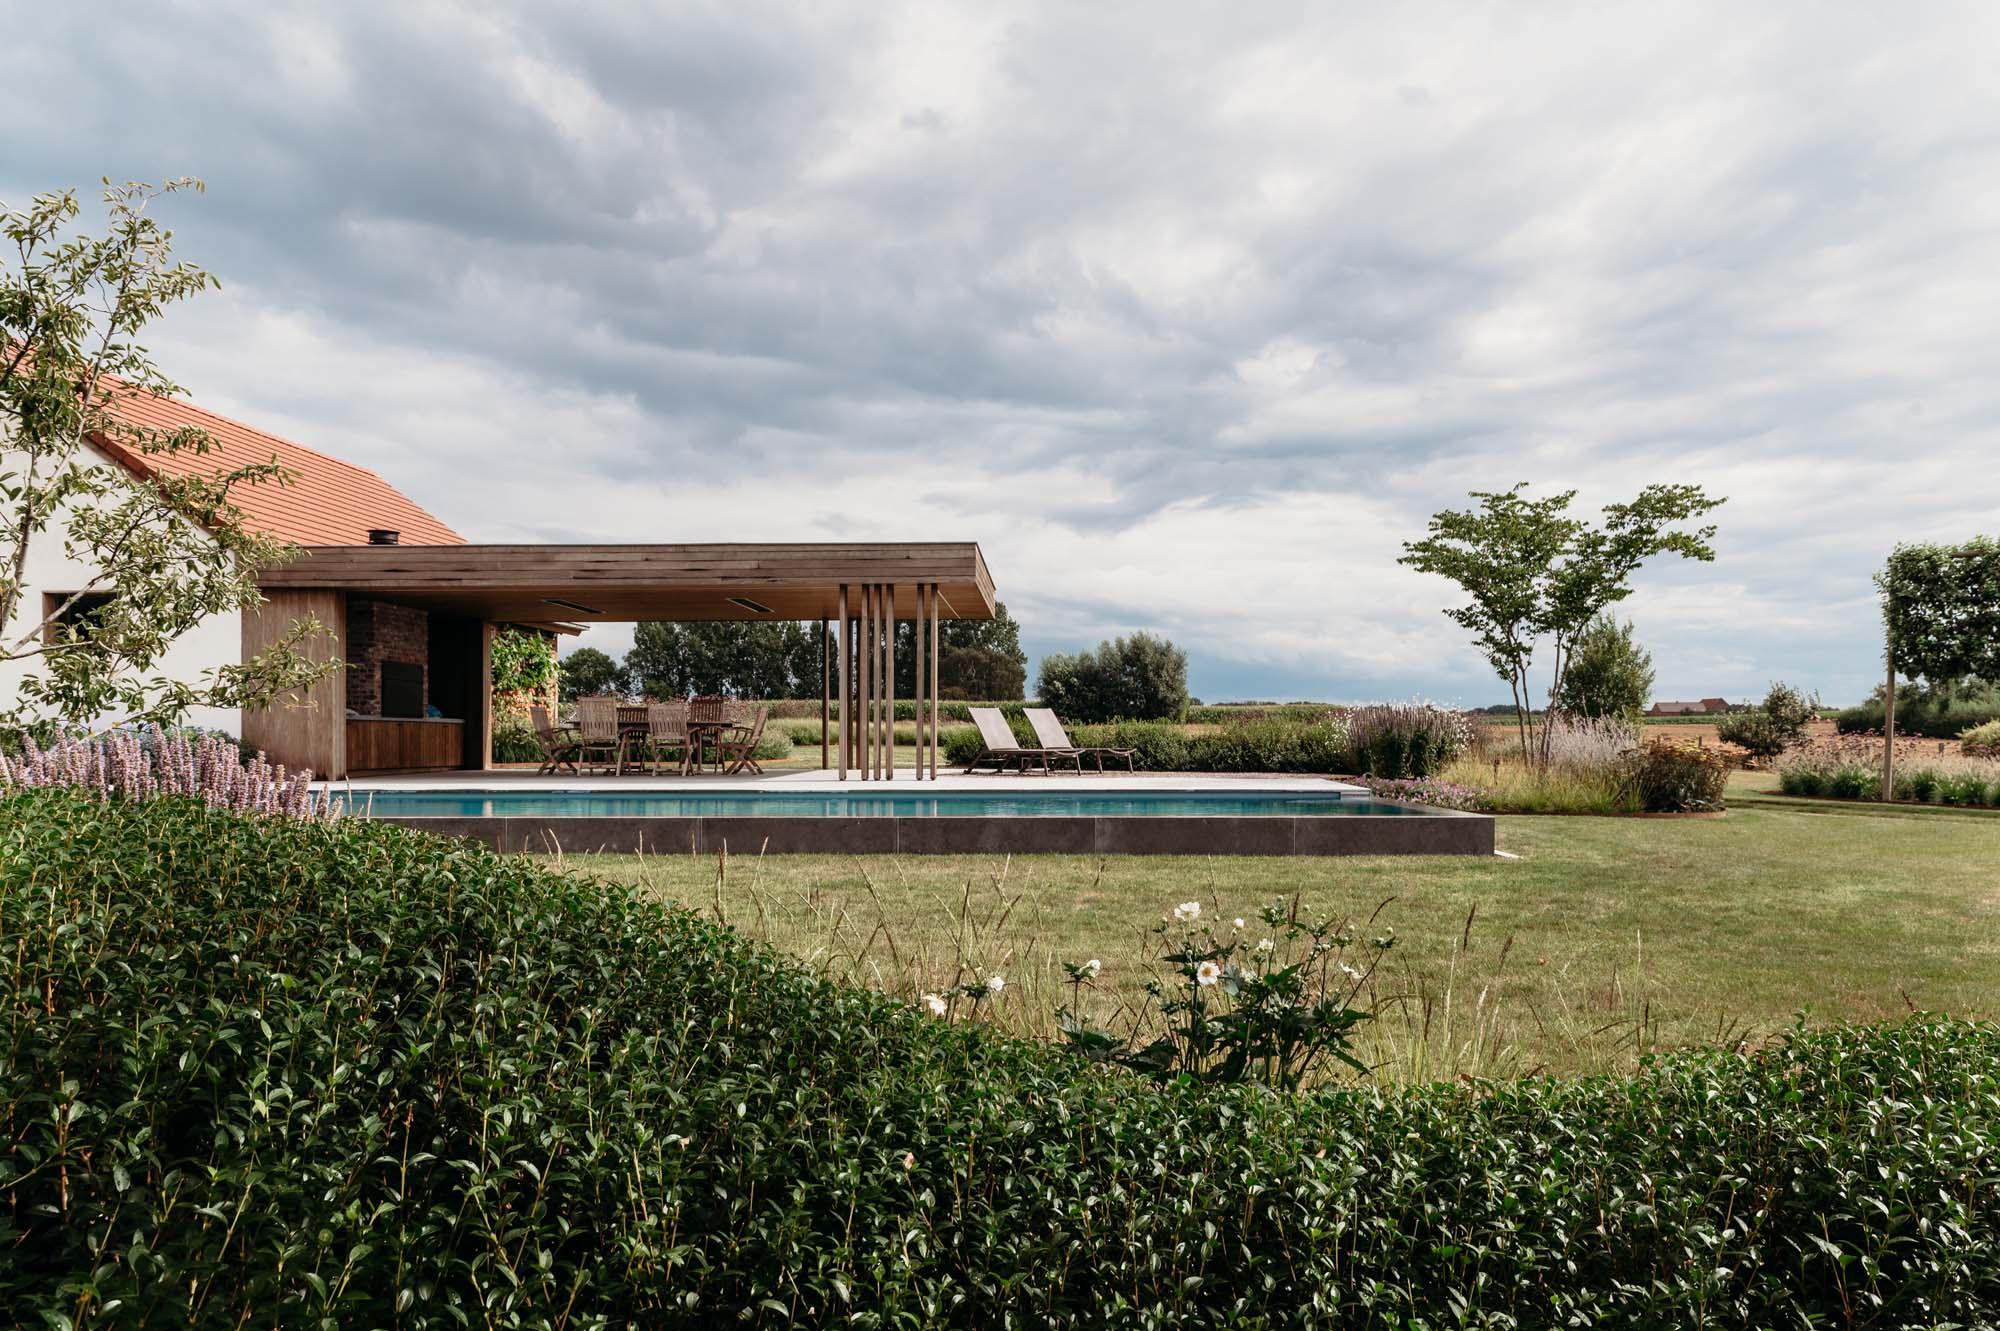 Moderne landschapstuin met modern poolhouse in padouk en biozwembad